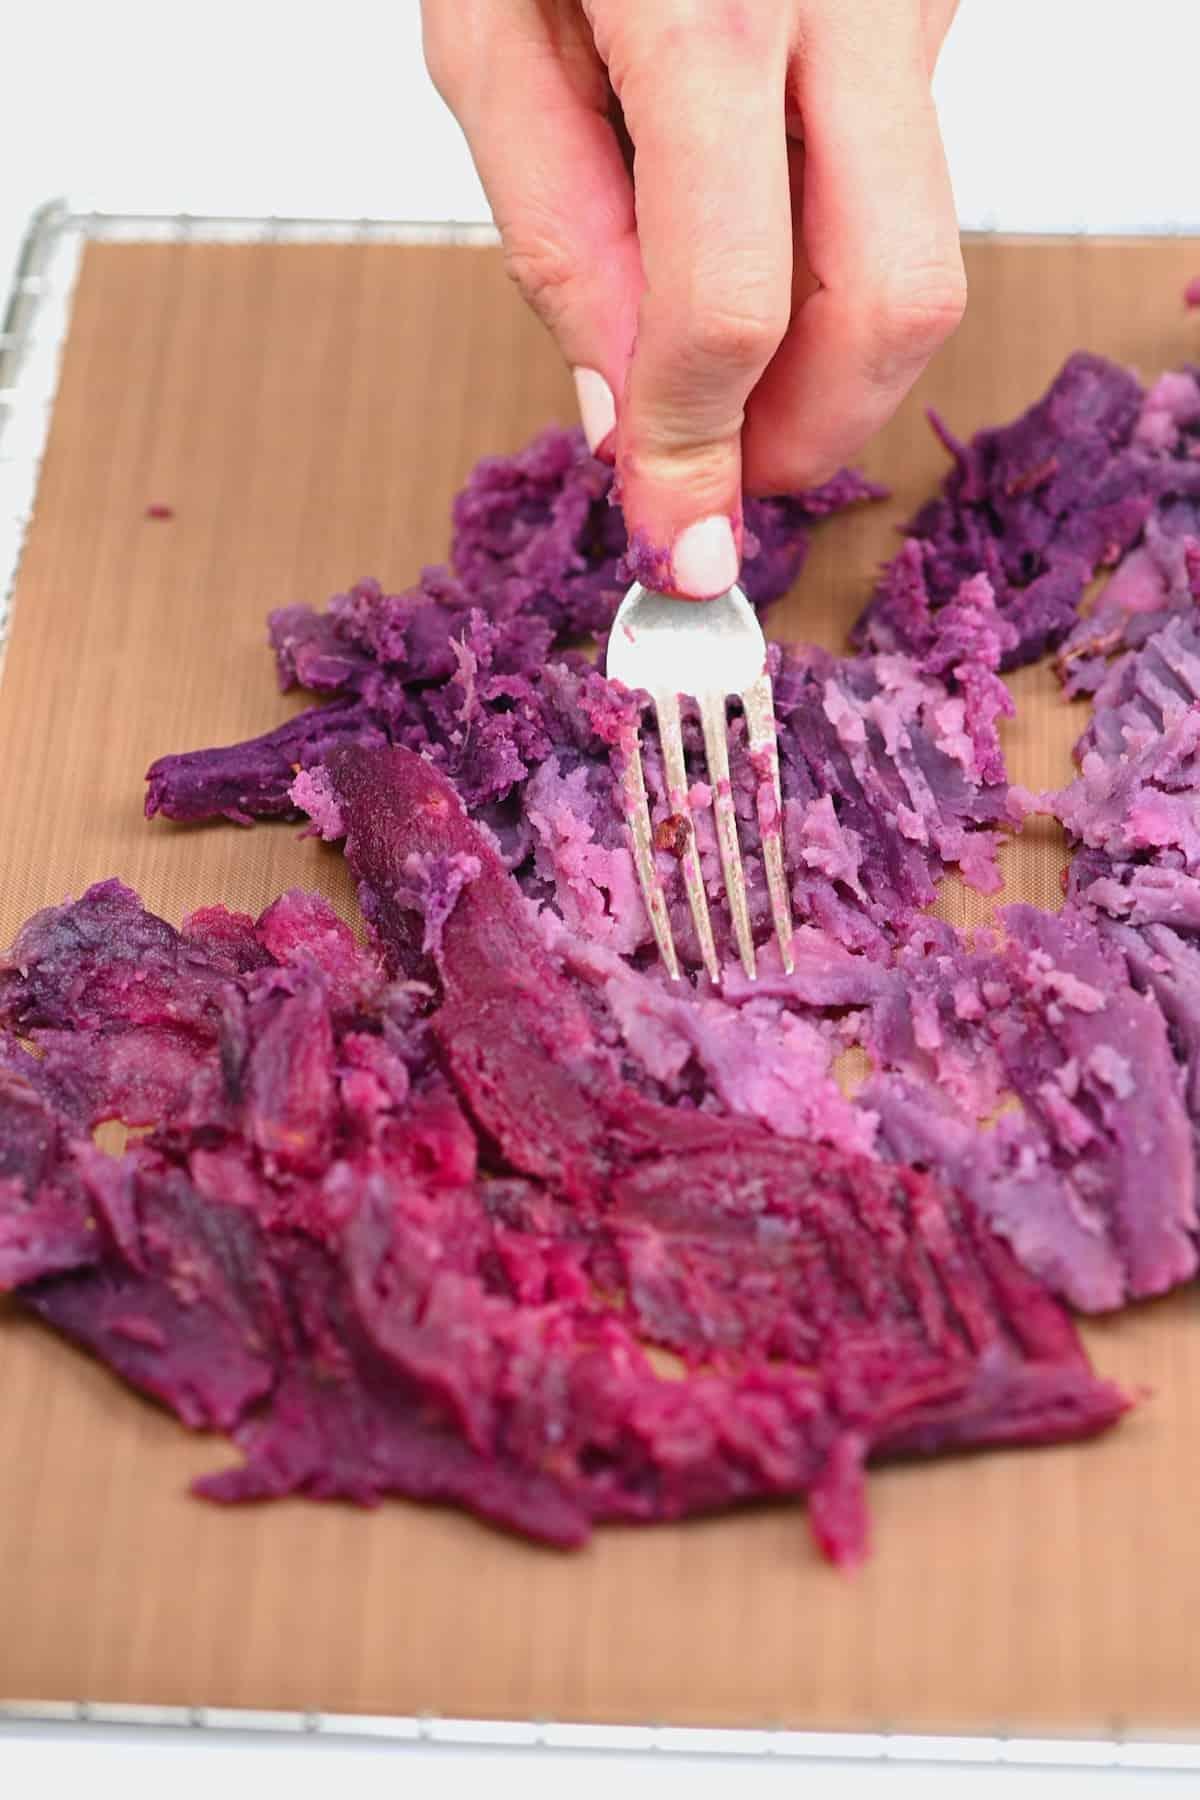 Mashing baked purple sweet potato